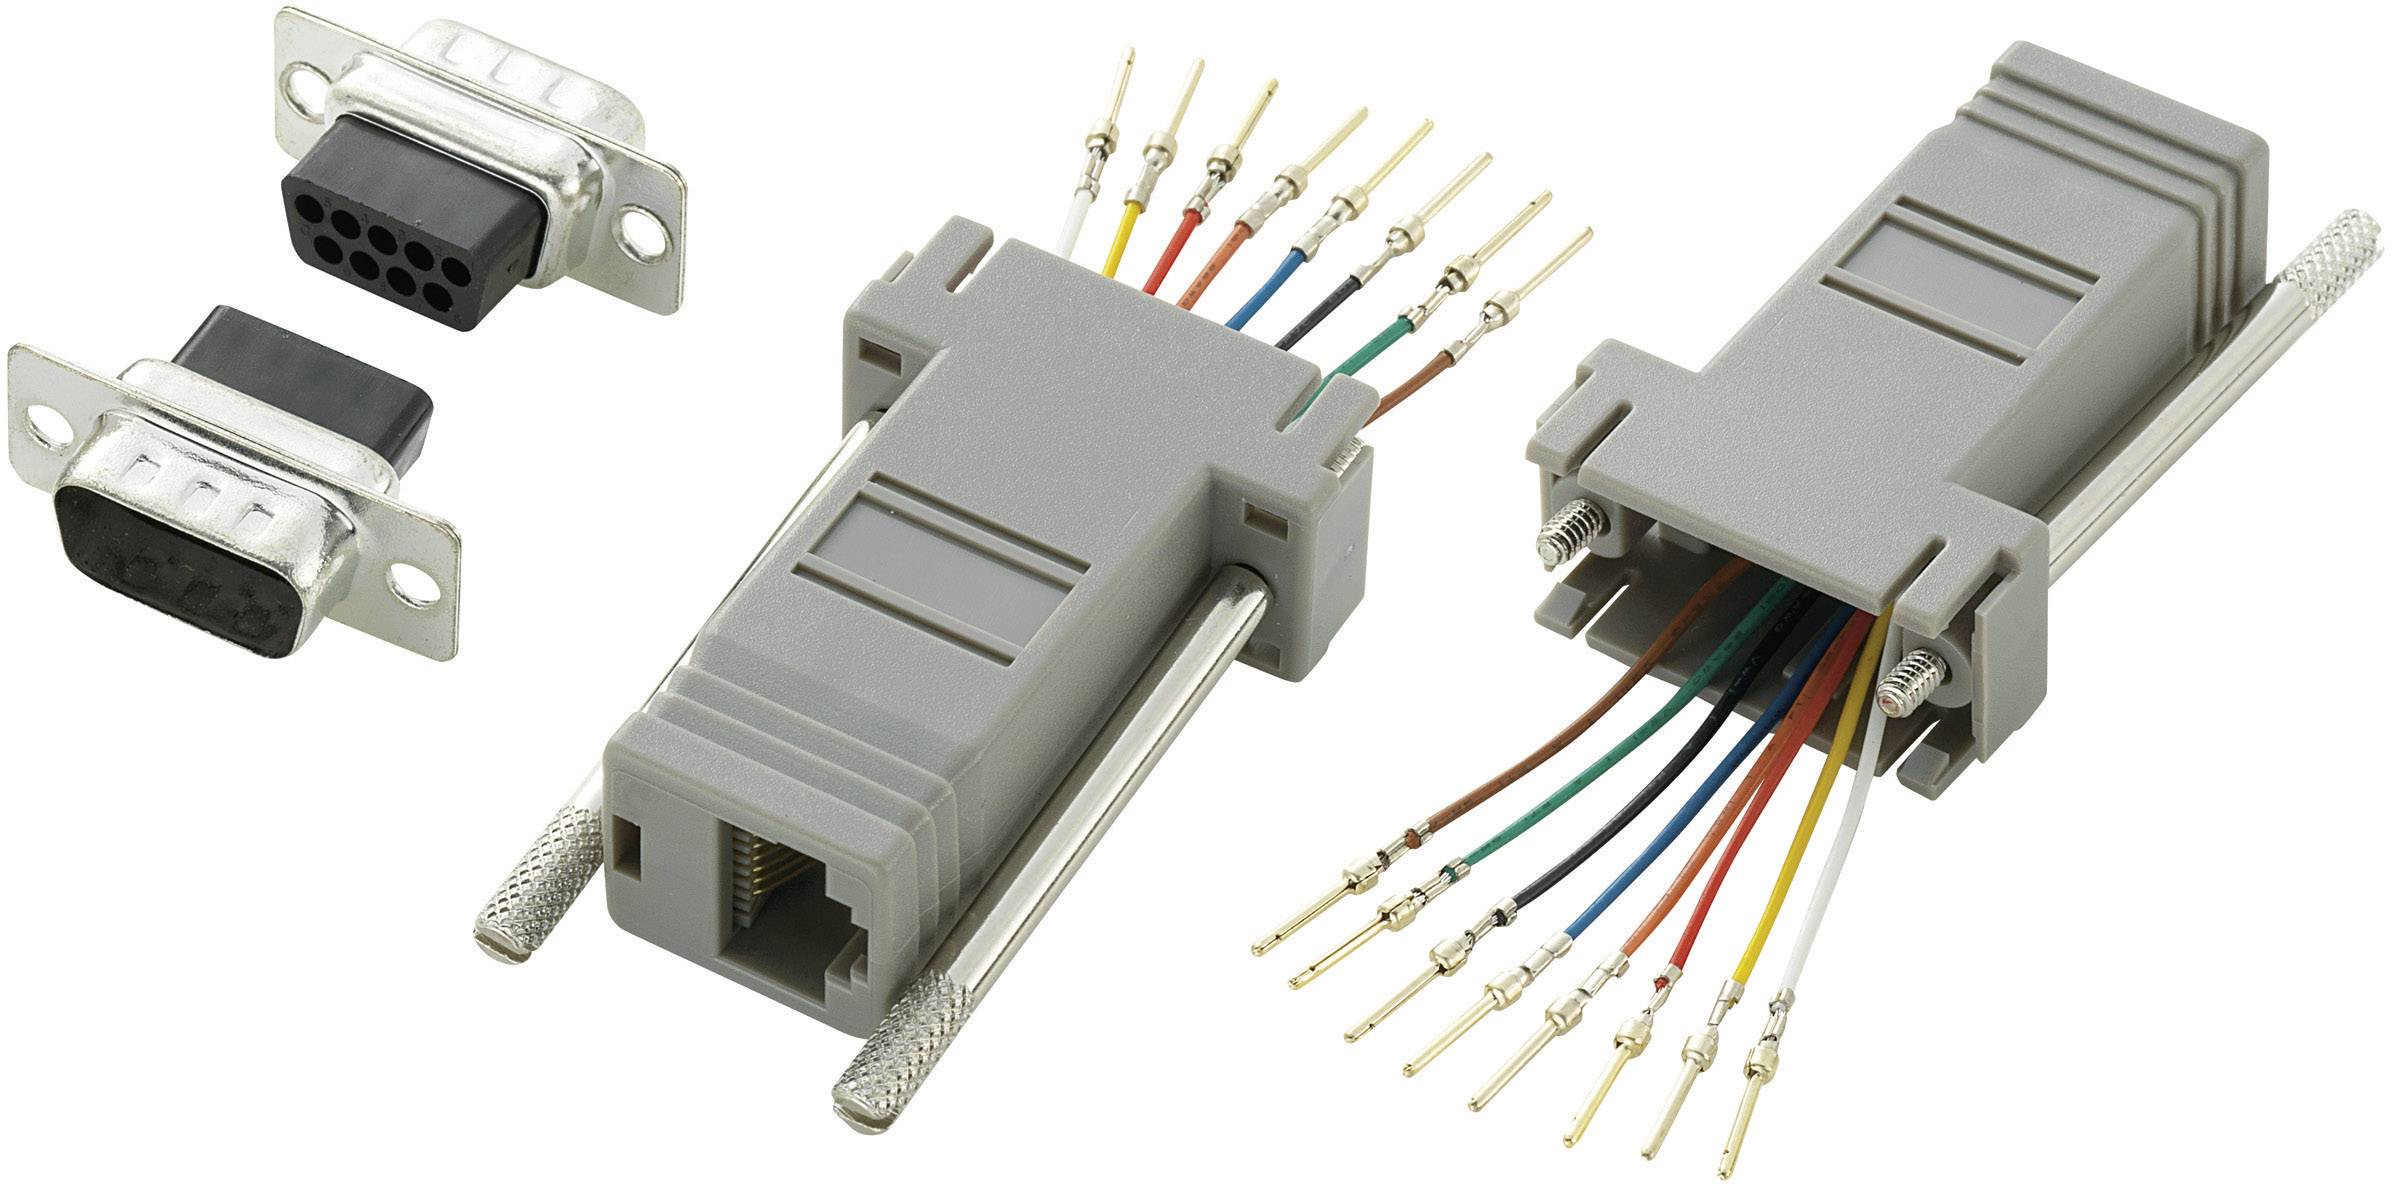 D-SUB adaptér TRU COMPONENTS, D-SUB zástrčka 9pólová - RJ45 zásuvka 1 ks